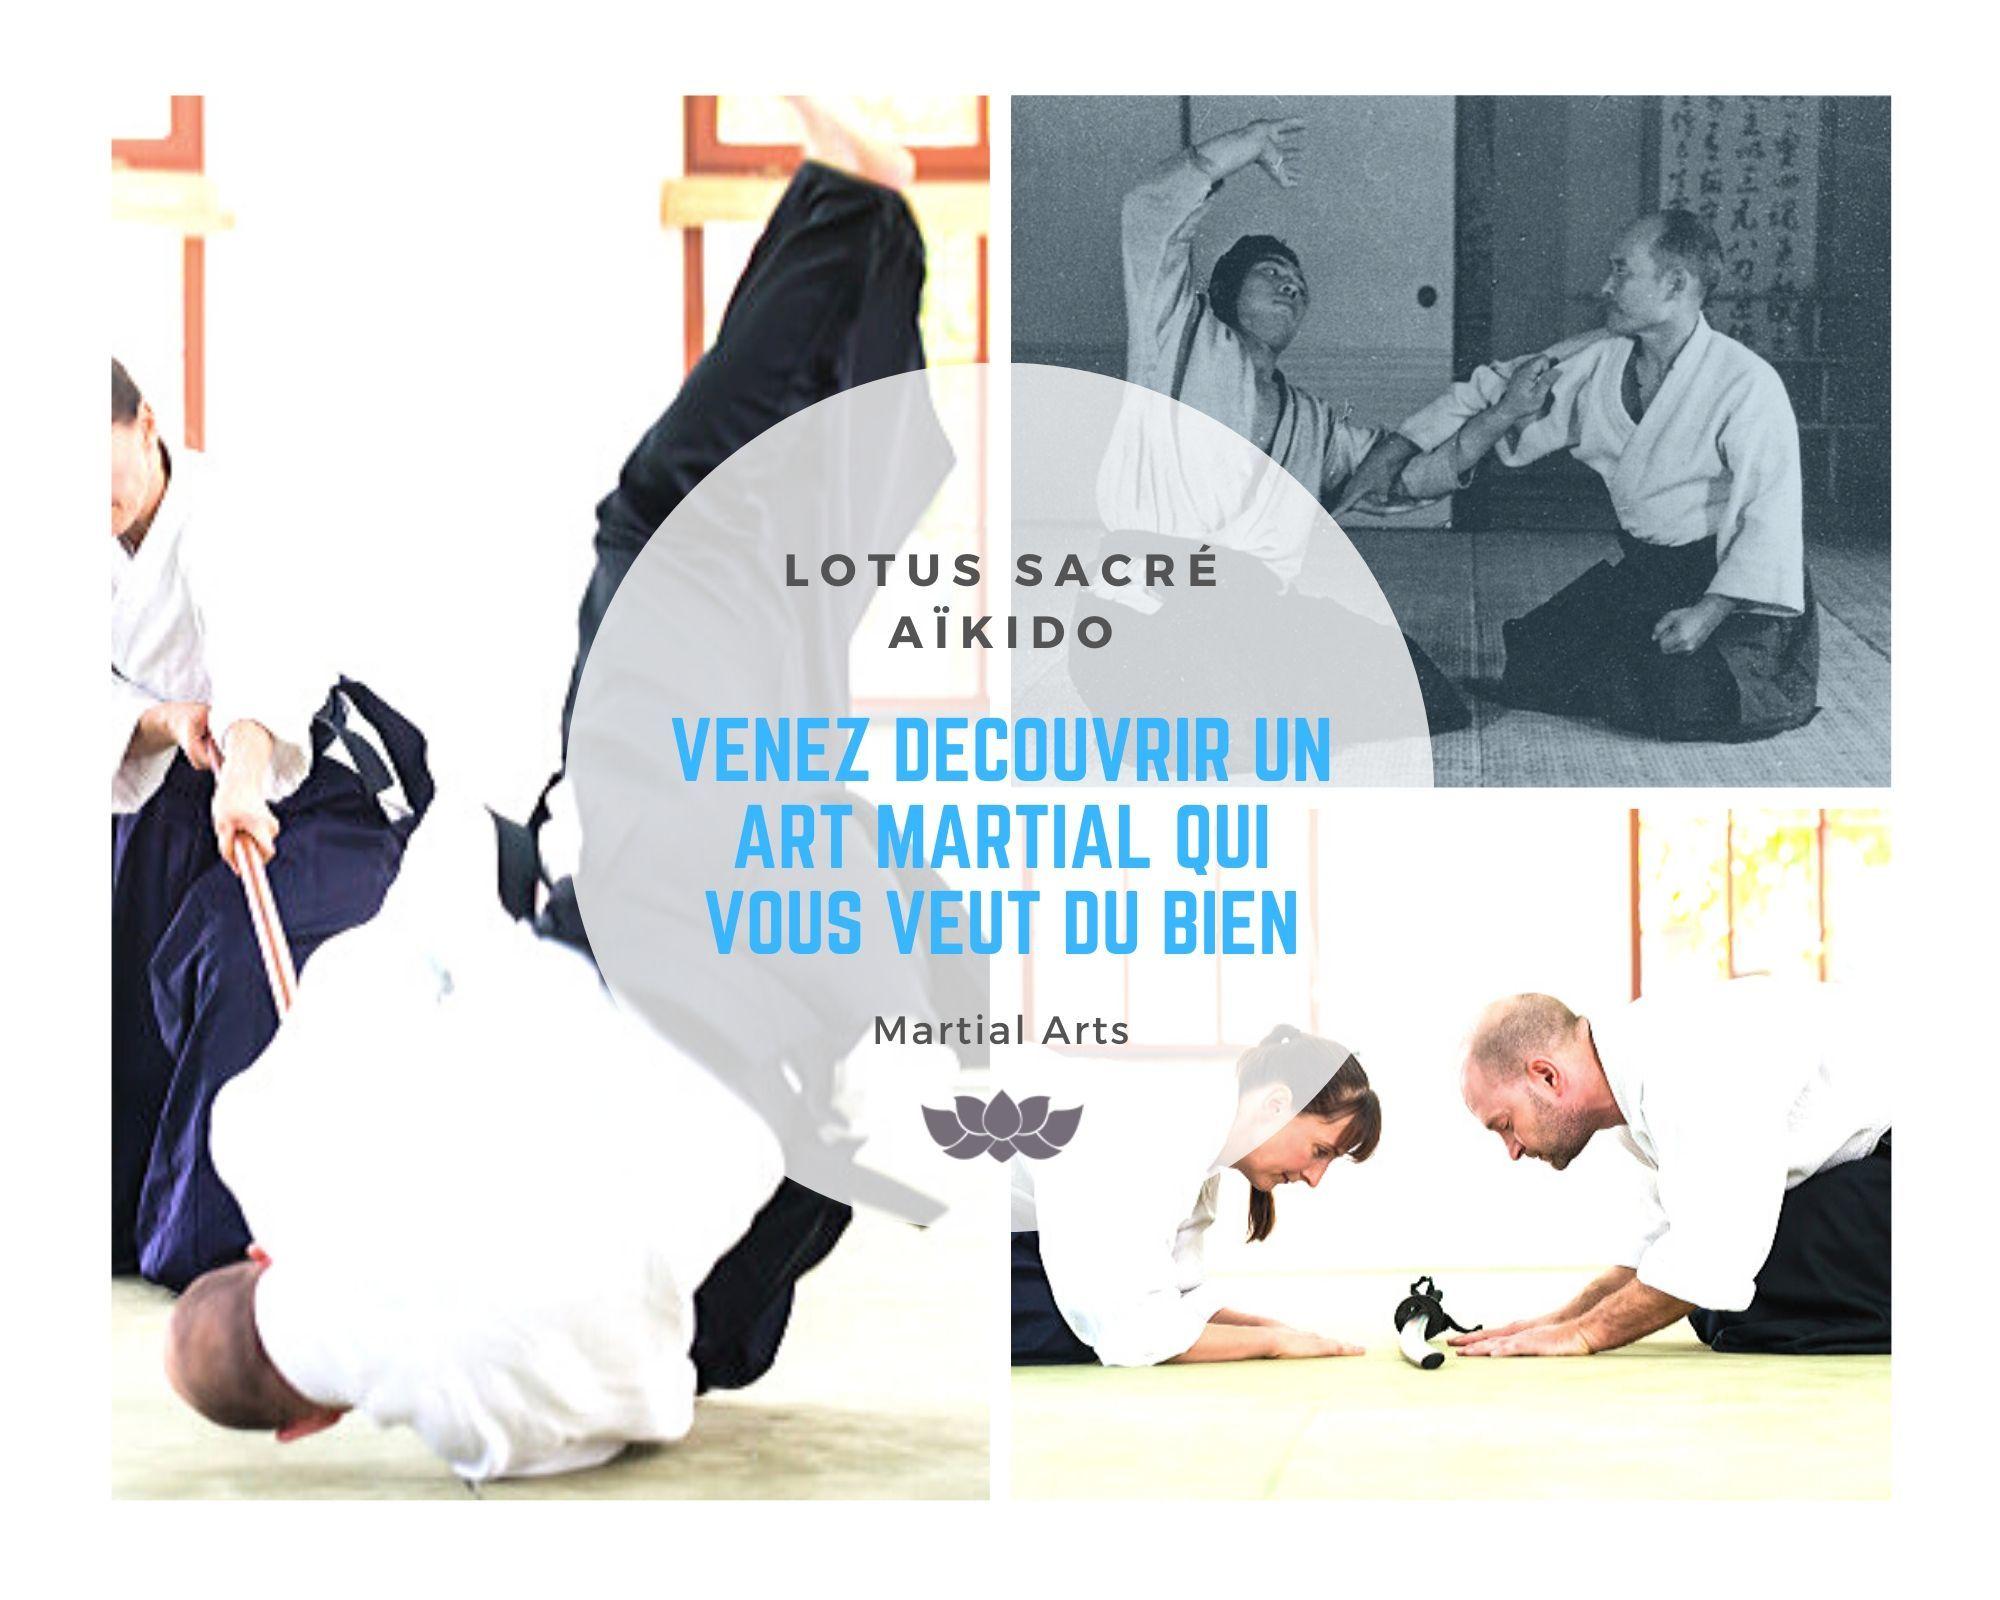 Aikido, Matial Arts